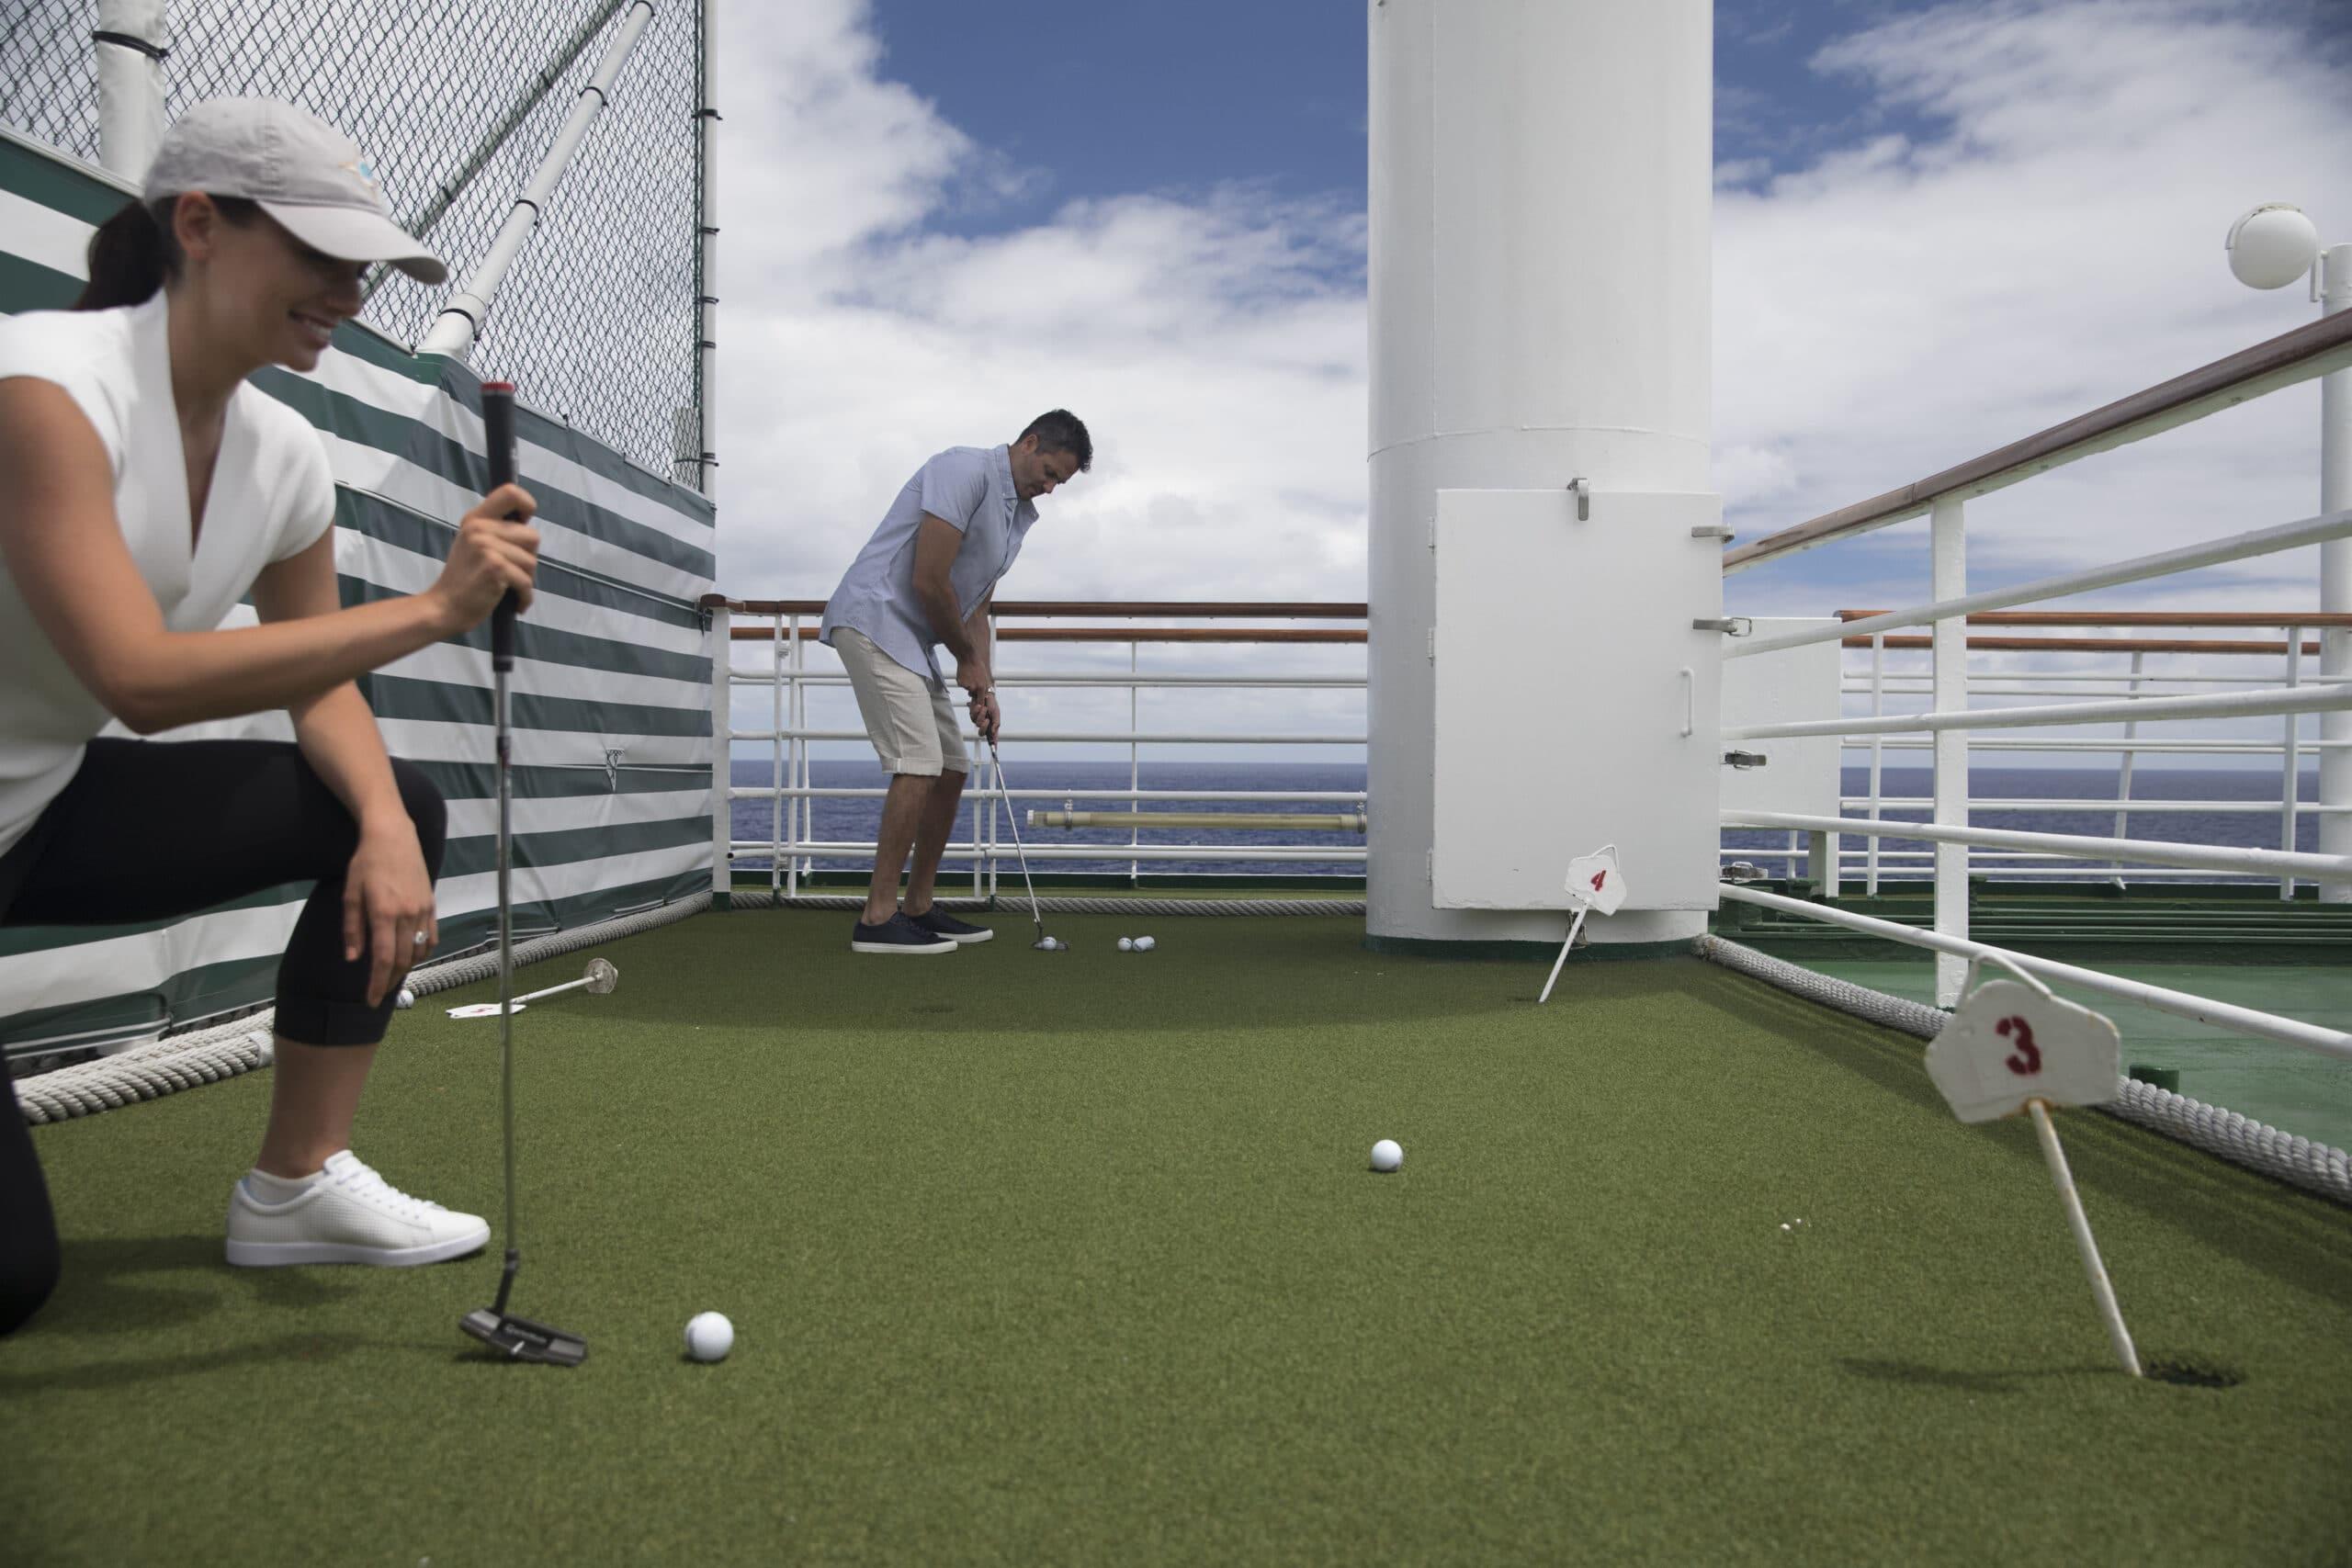 Cruiseschip-Crystal Symphony-Crystal Cruises-Golf